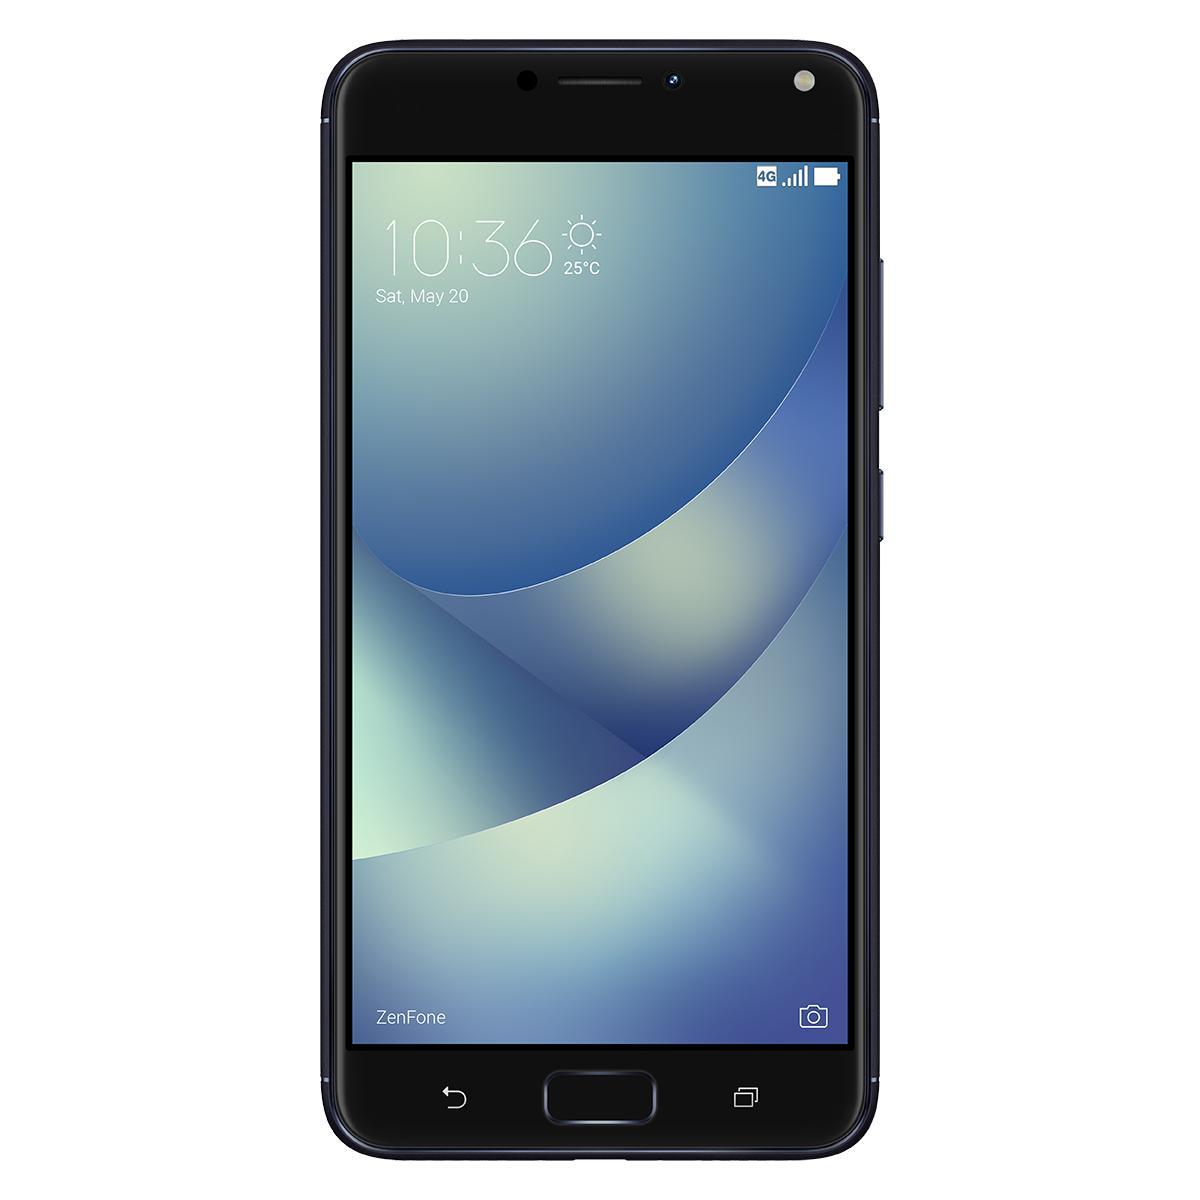 asus zenfone zc554kl 4a071ww dual sim 4g 32gb black smartphone. Black Bedroom Furniture Sets. Home Design Ideas